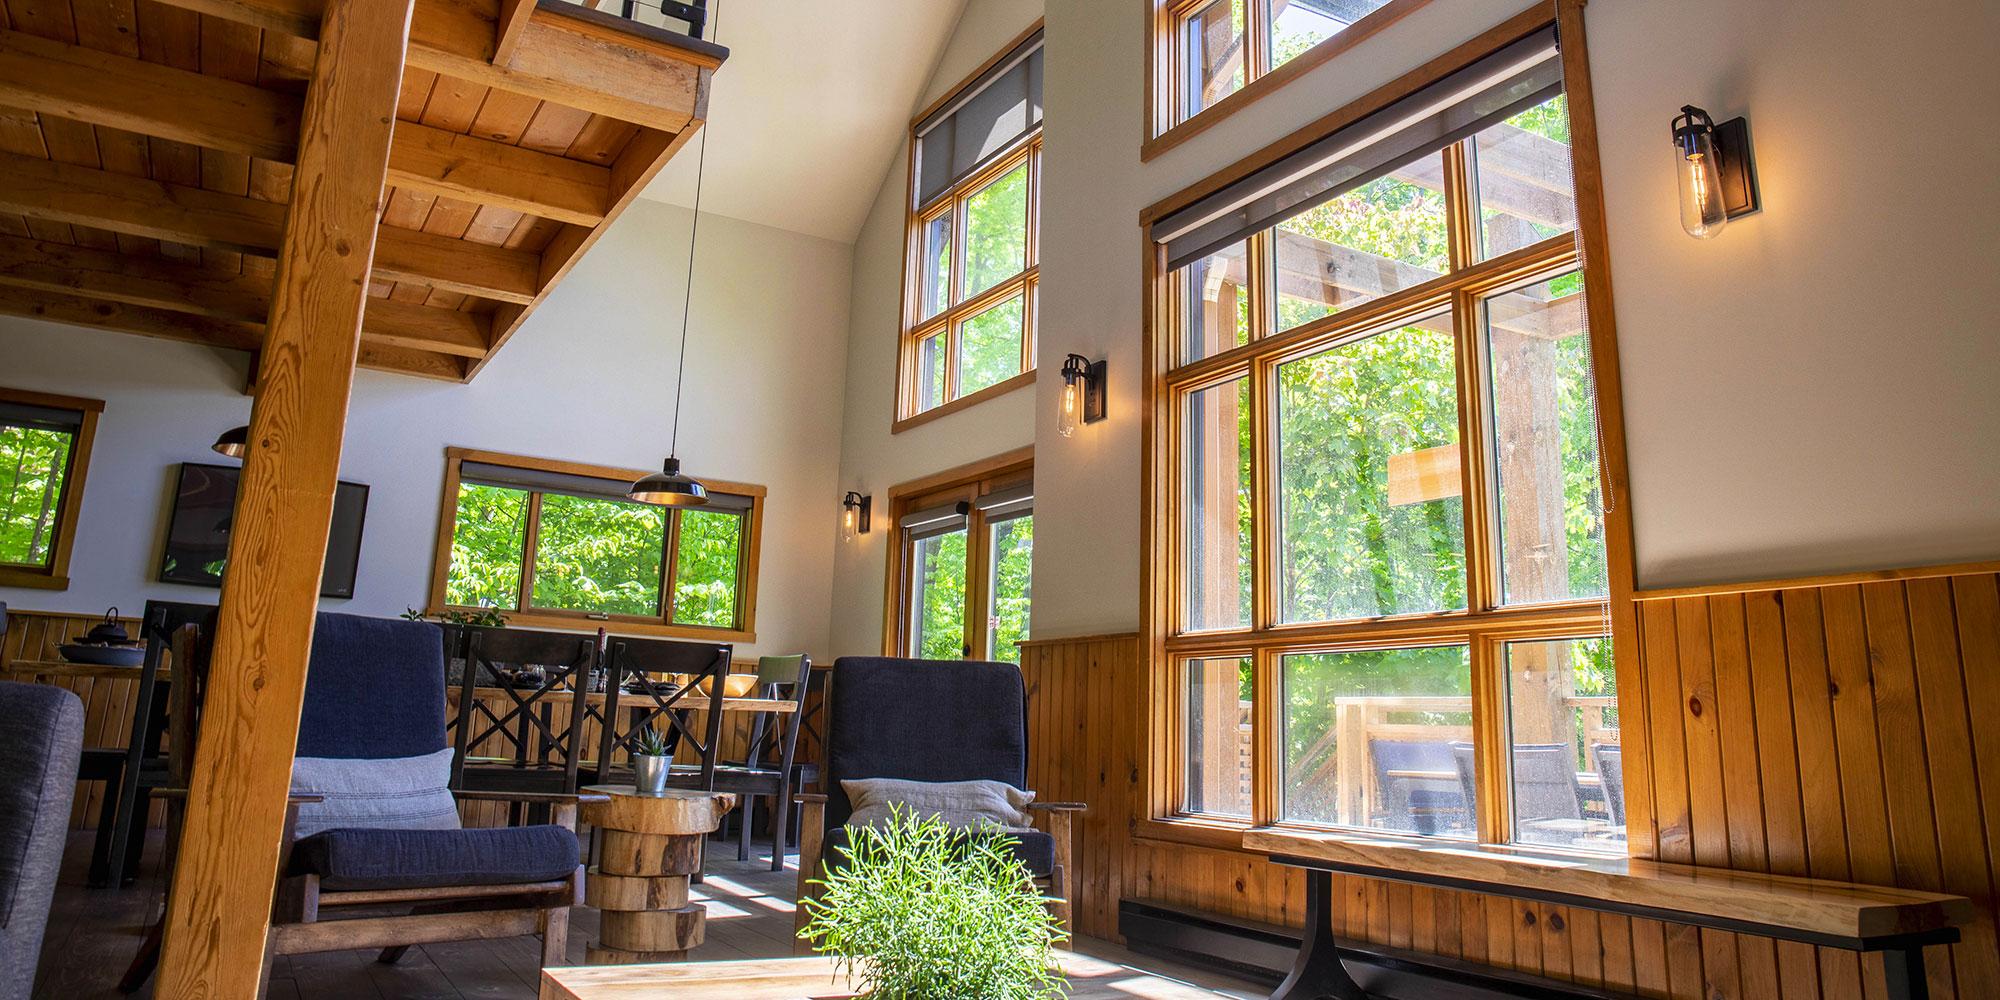 Nordik Lodge Accommodation Rental Package Nordik